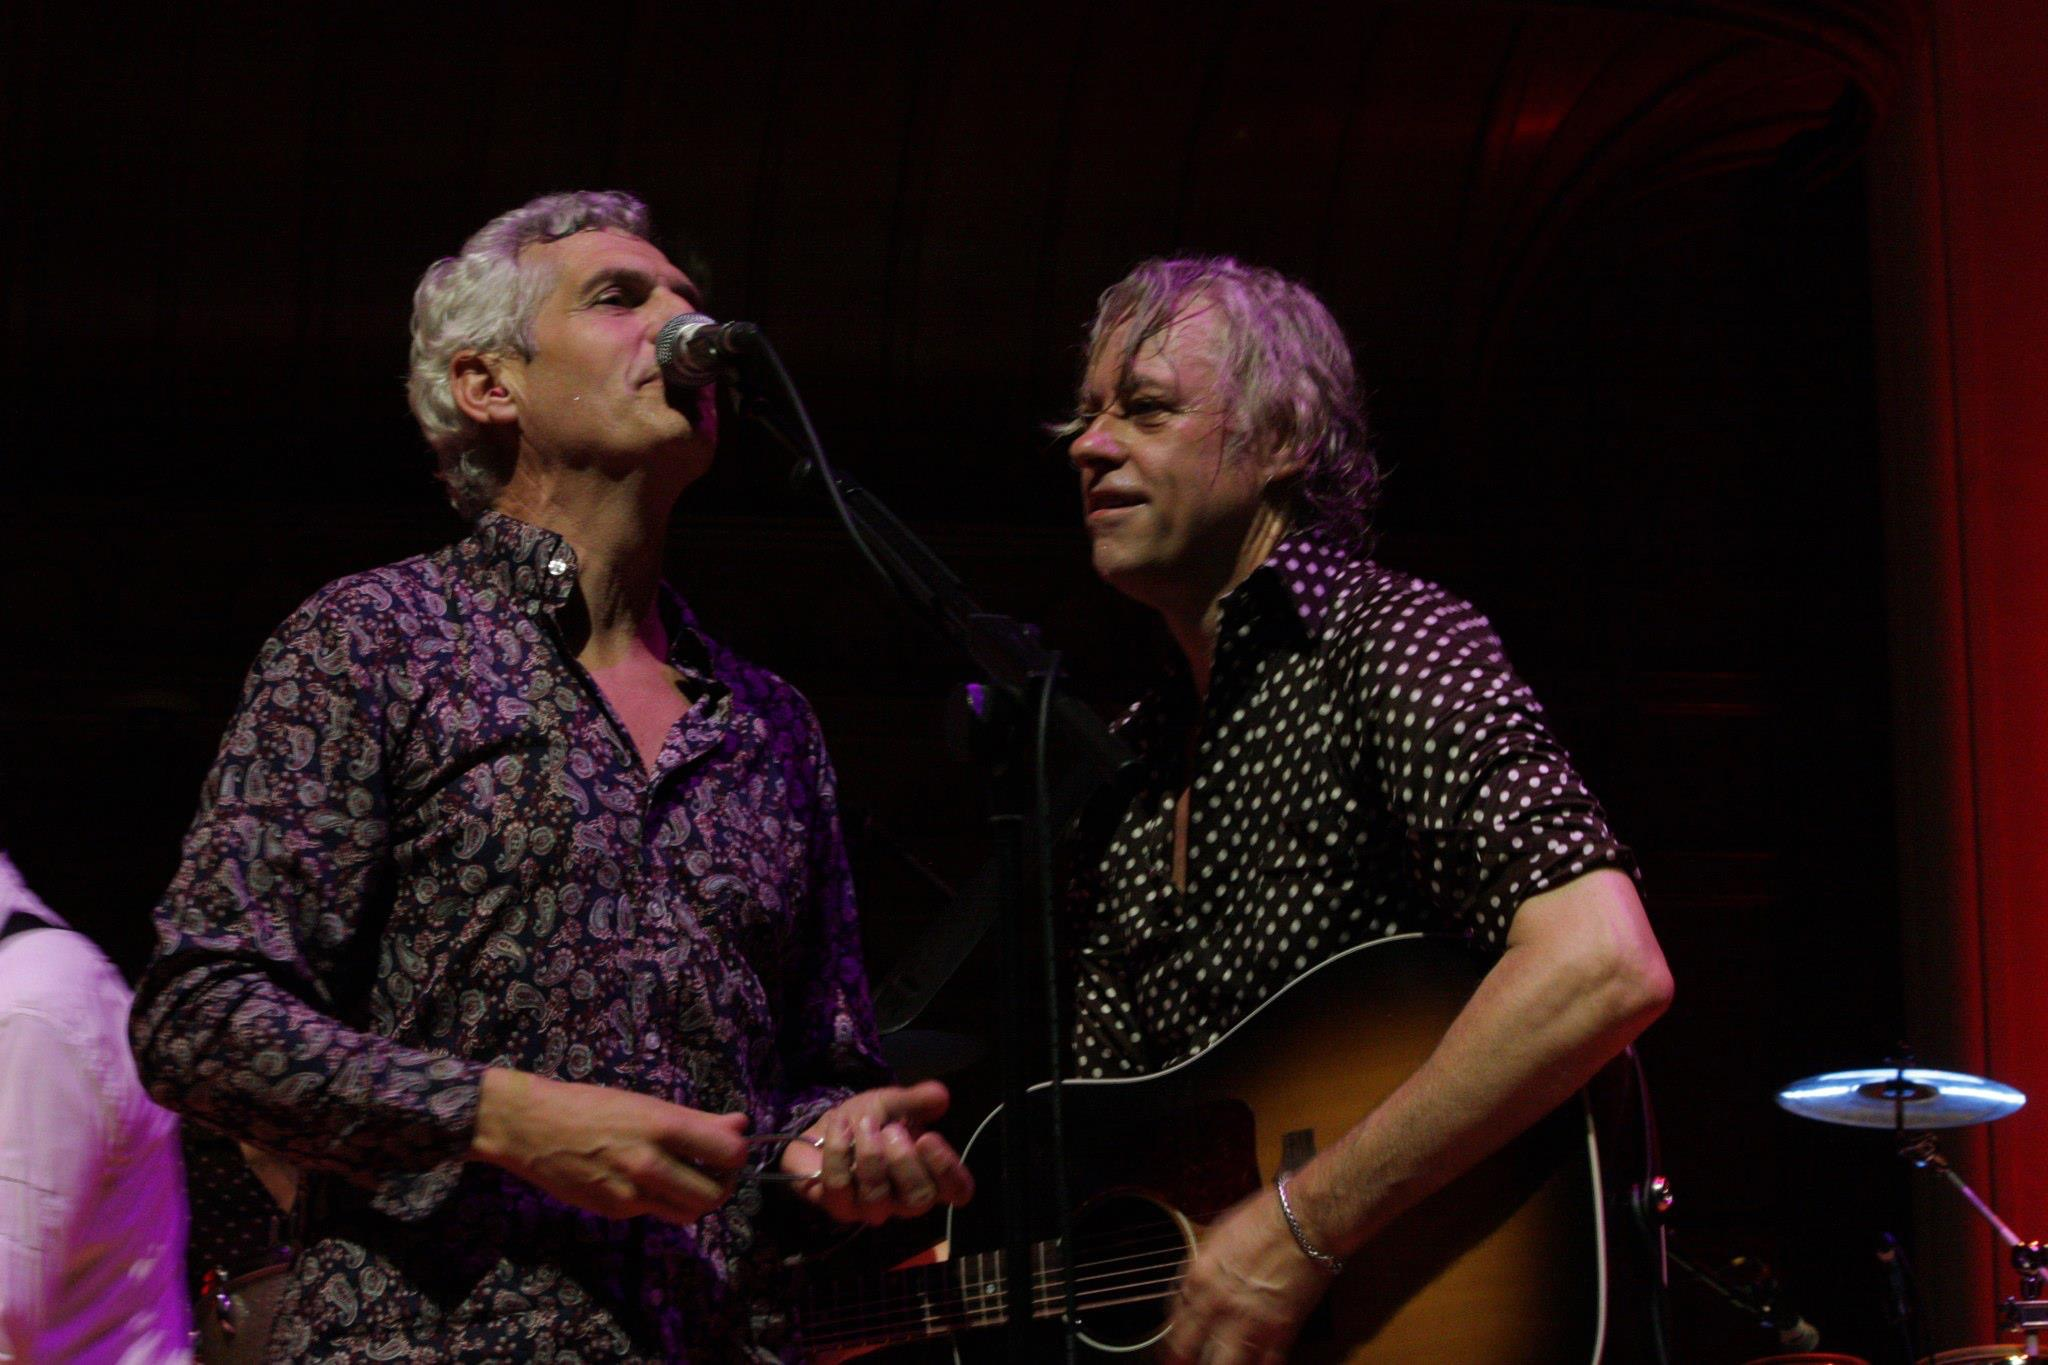 Niall Power and Bob Geldof